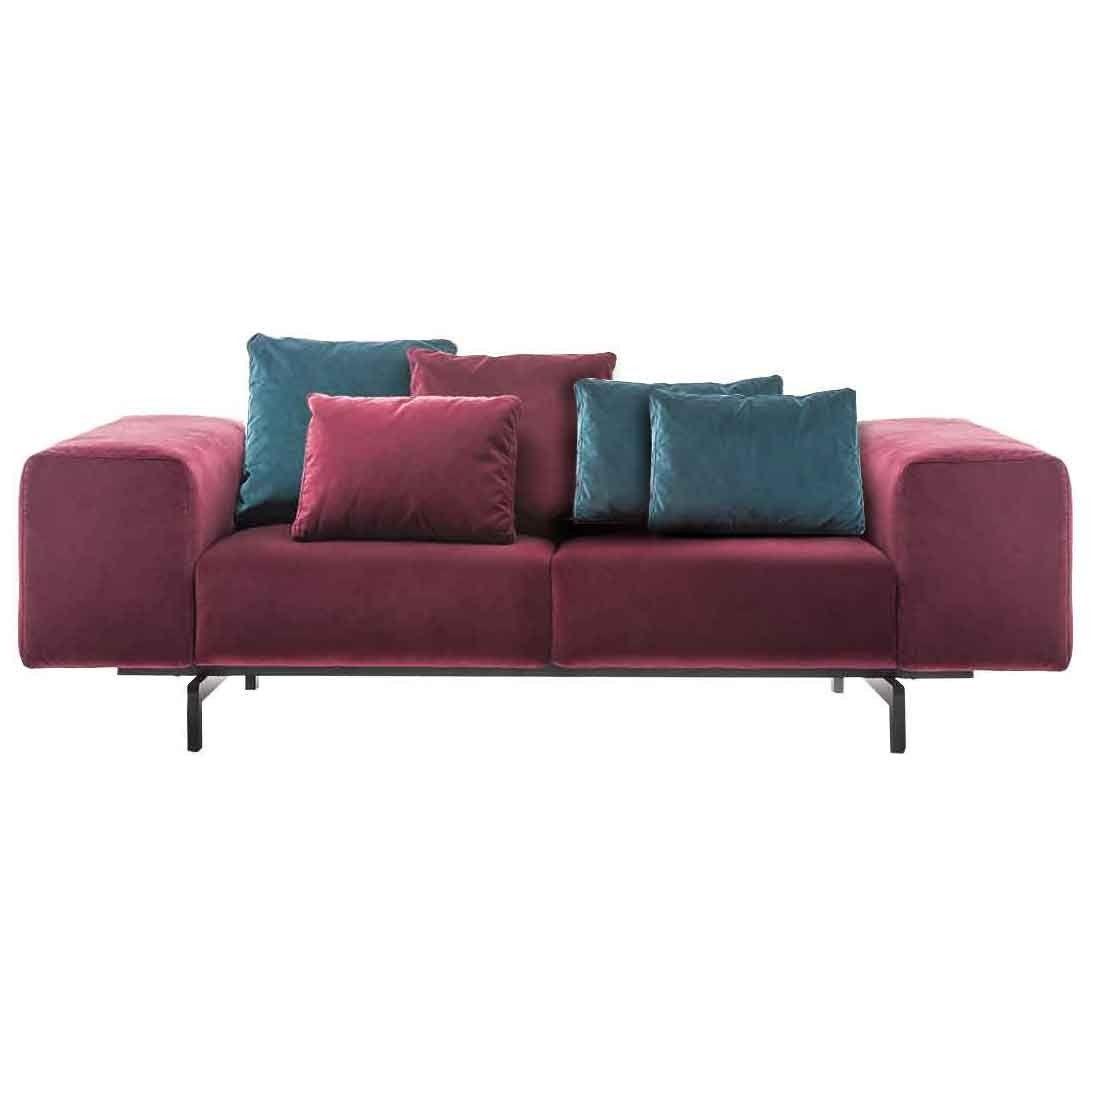 kartell sofa largo key town table velluto 2 sitzer flinders versendet